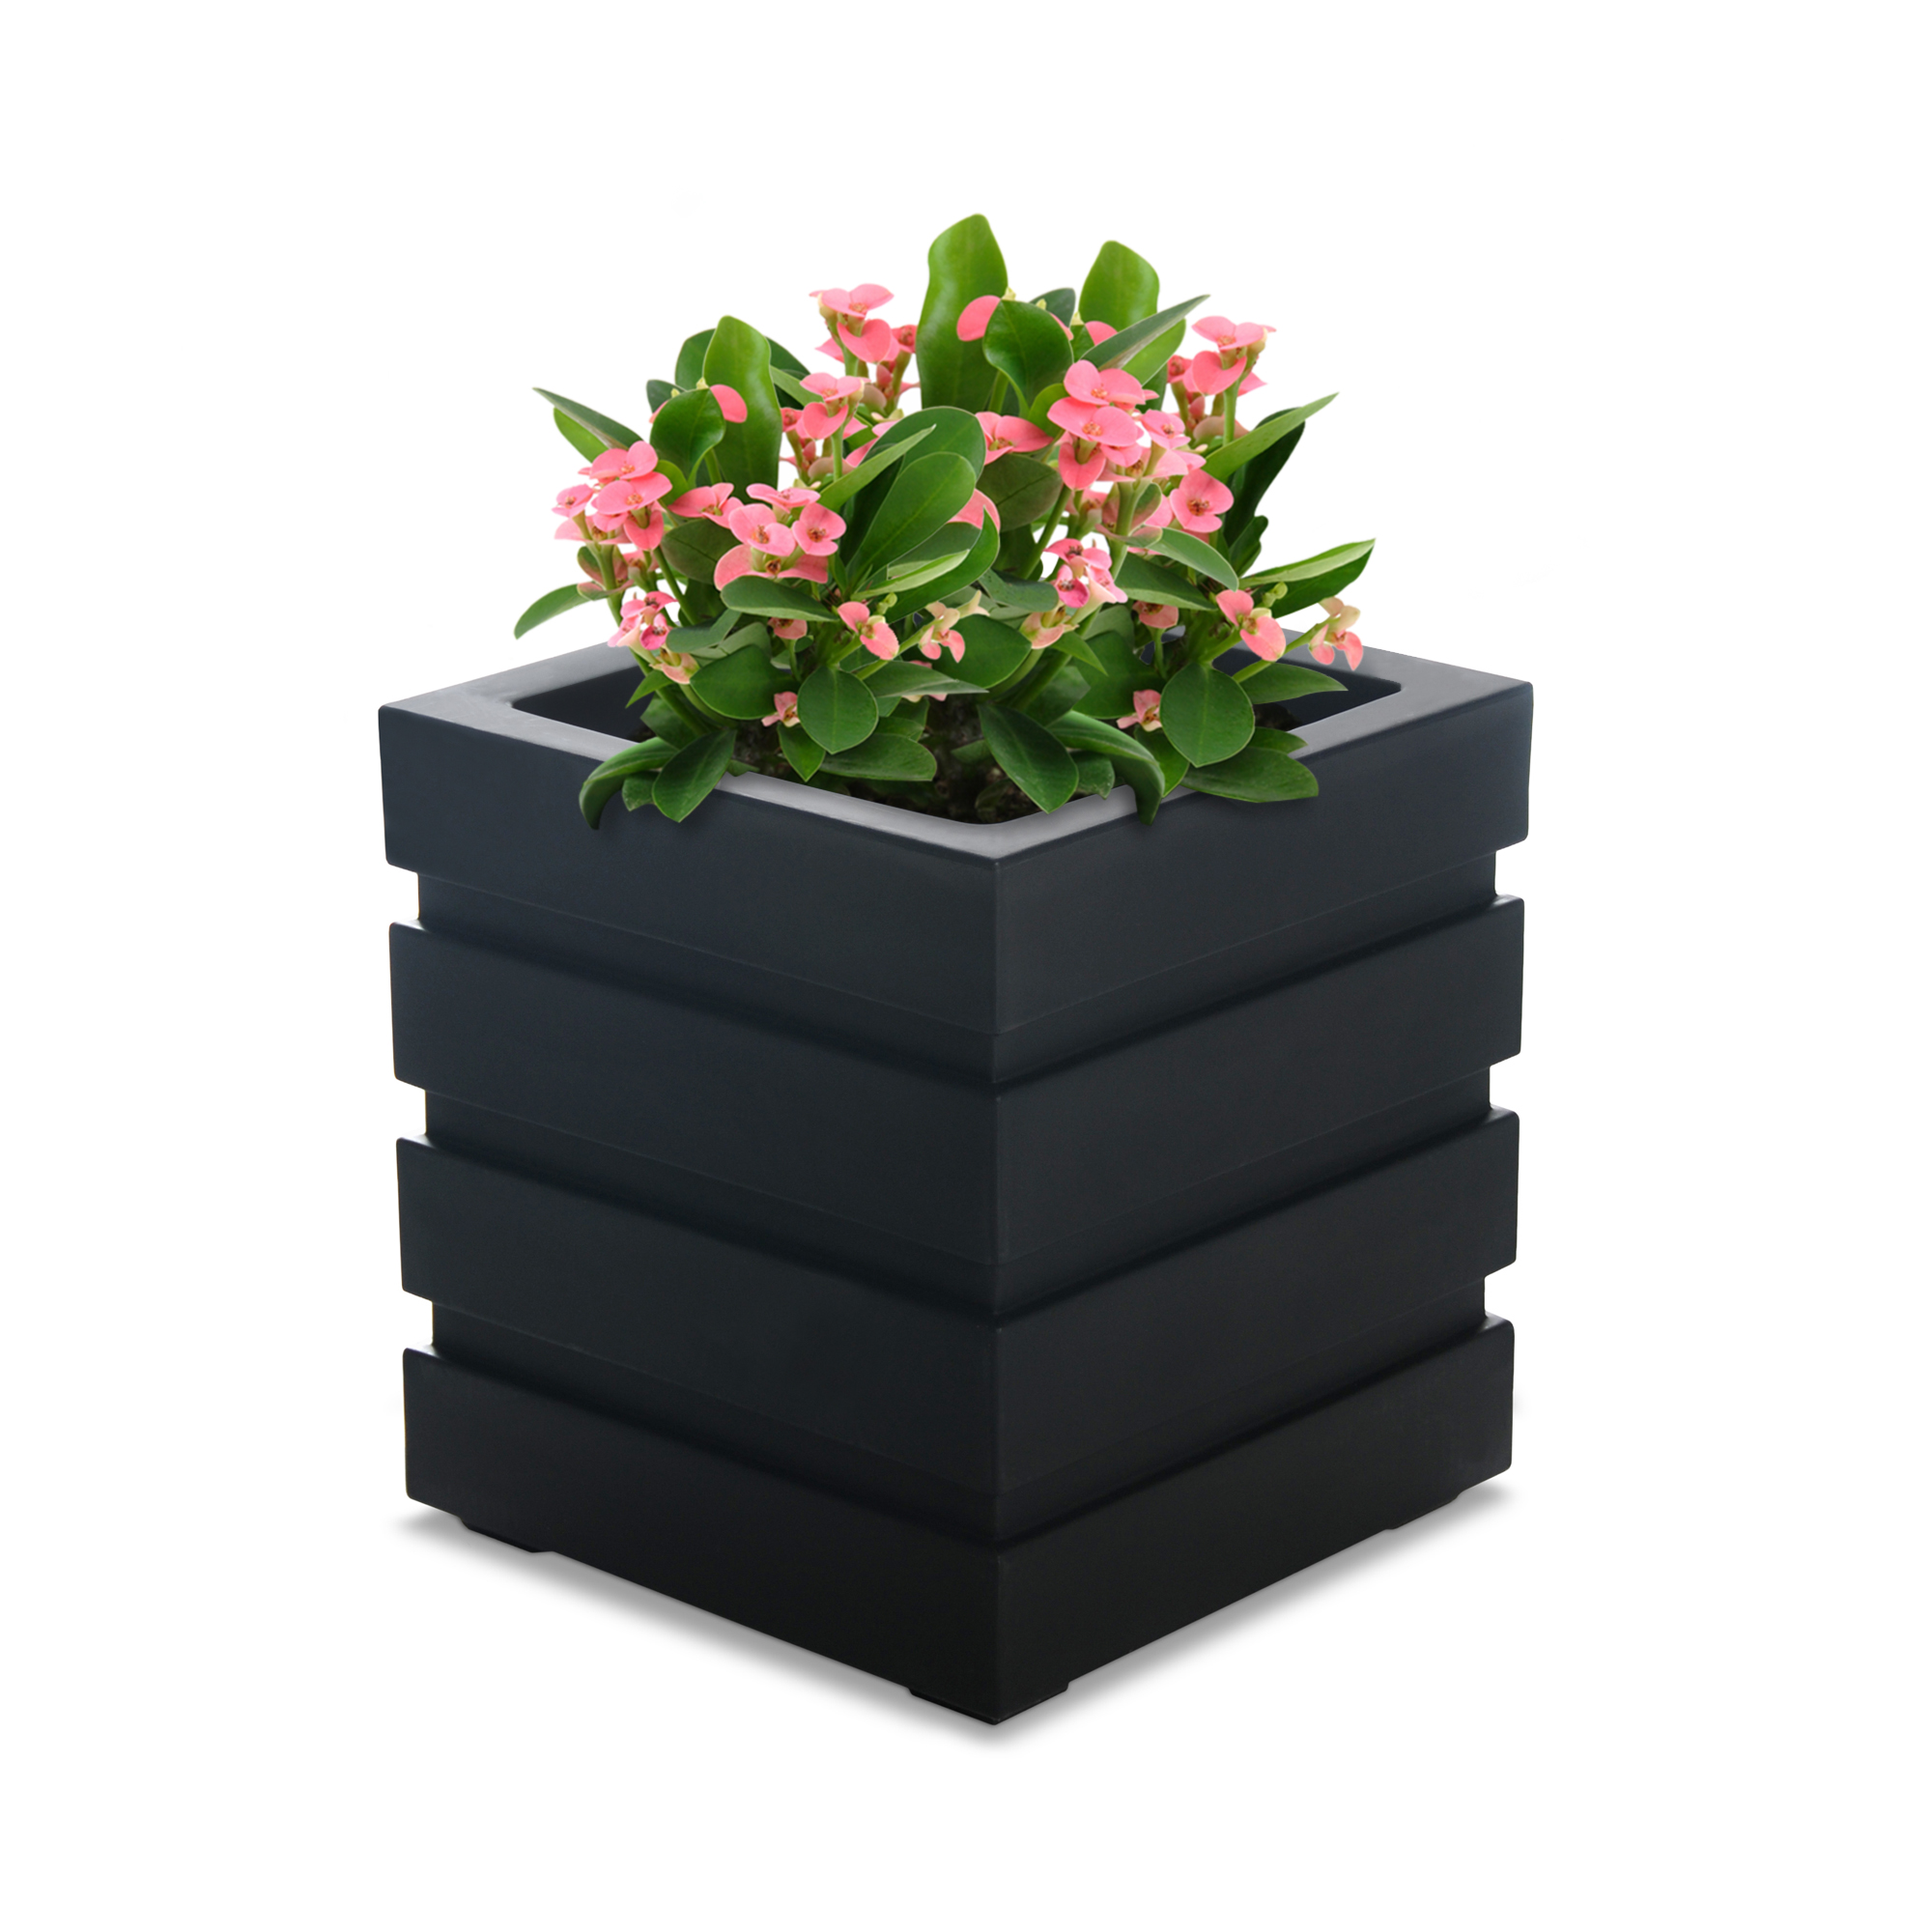 Freeport Patio Planter 18x18 - Black